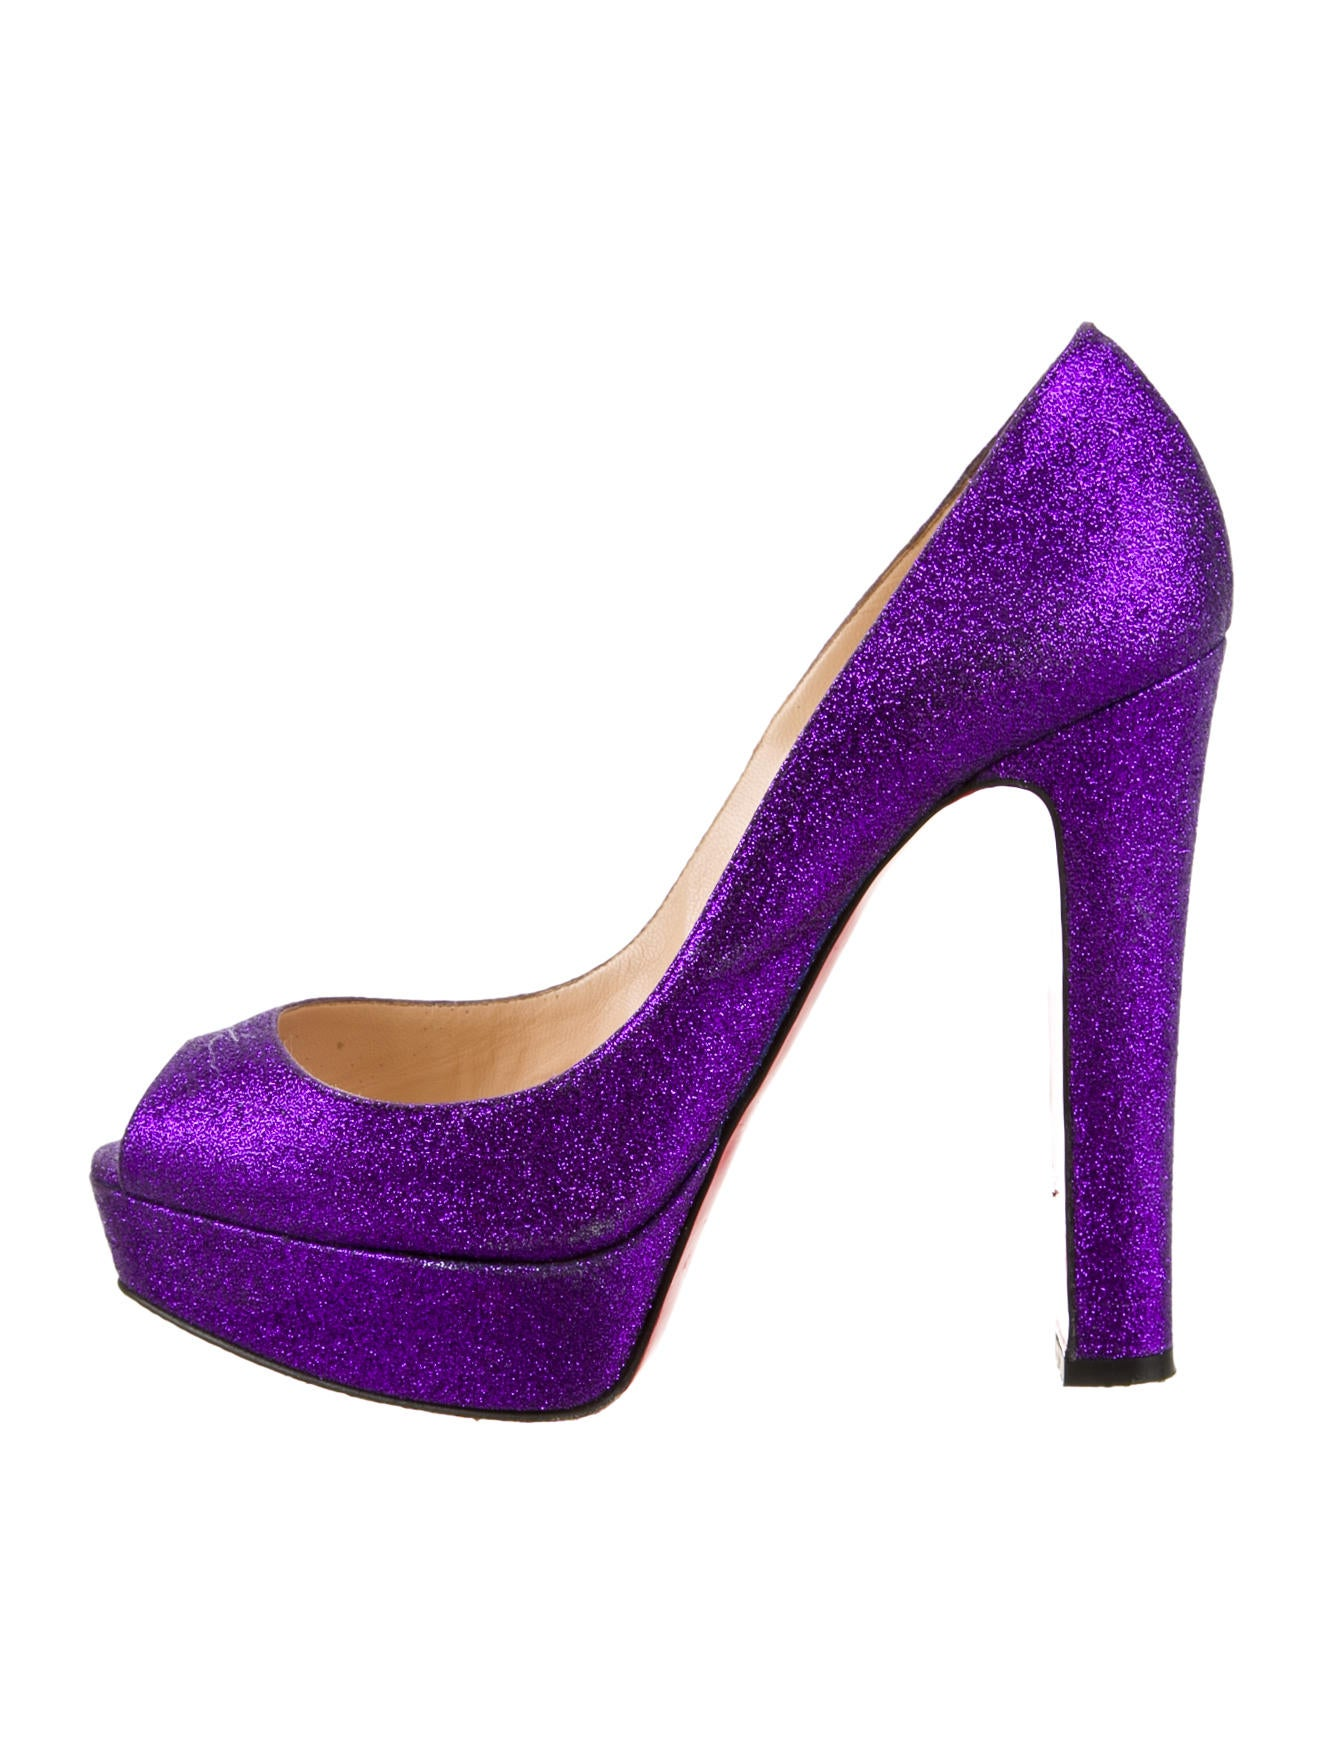 christian louboutin Bambou peep-toe platform glitter pumps Purple woven  covered block heels a5b9c6ebf